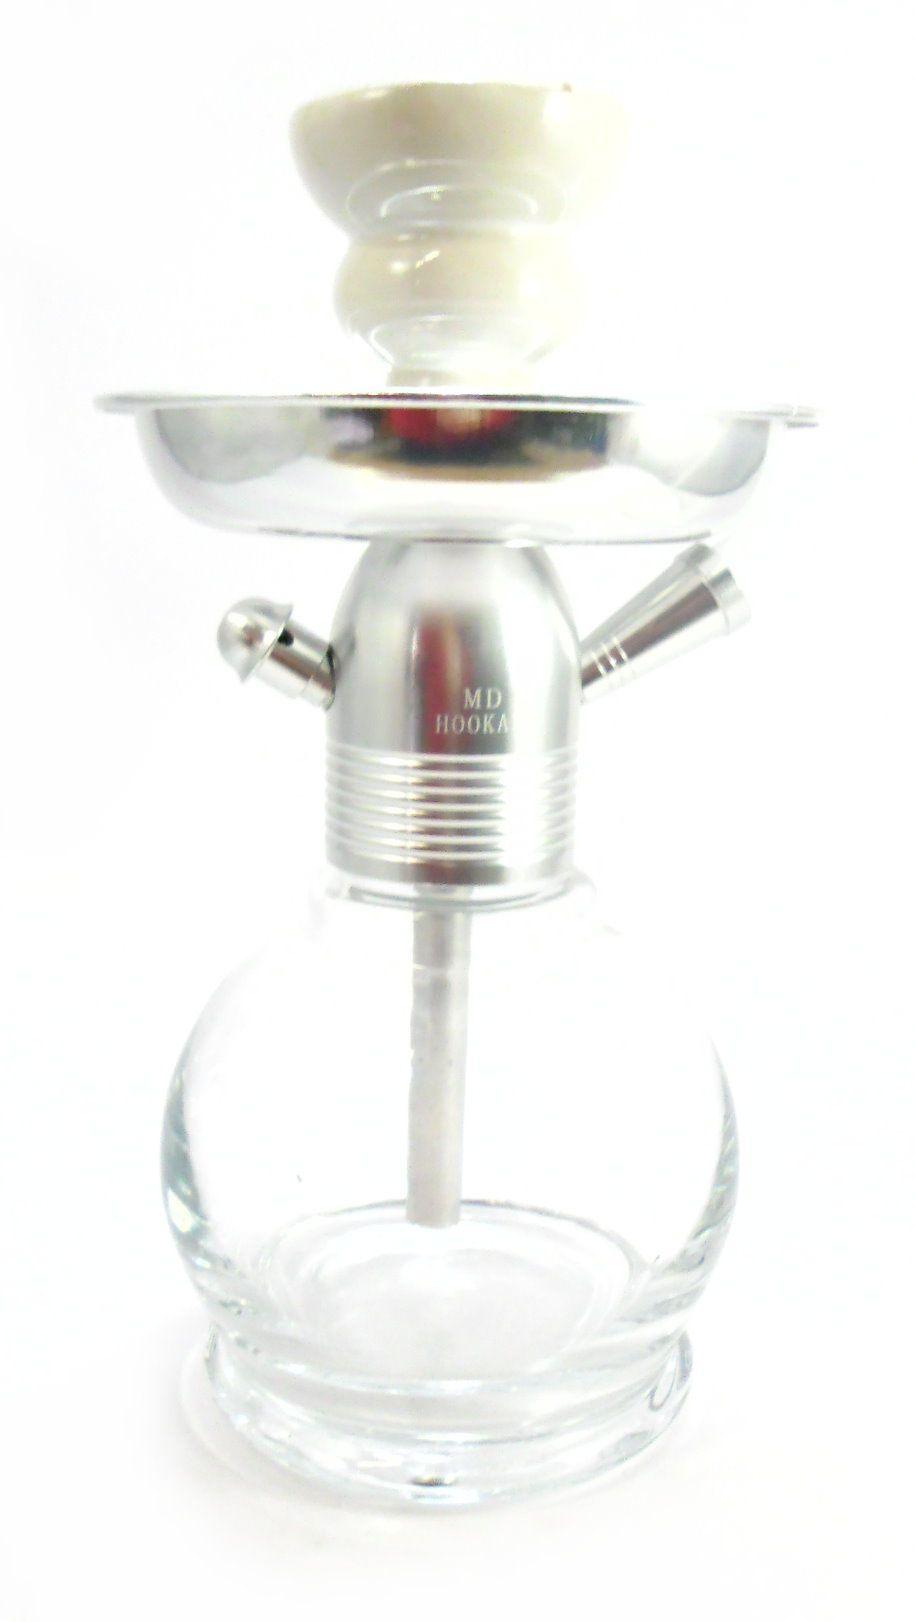 Narguile MD Hookah NEW 26cm CROMADO. Vaso Ball transp., stem usinado em alumínio, pintura anodizada.